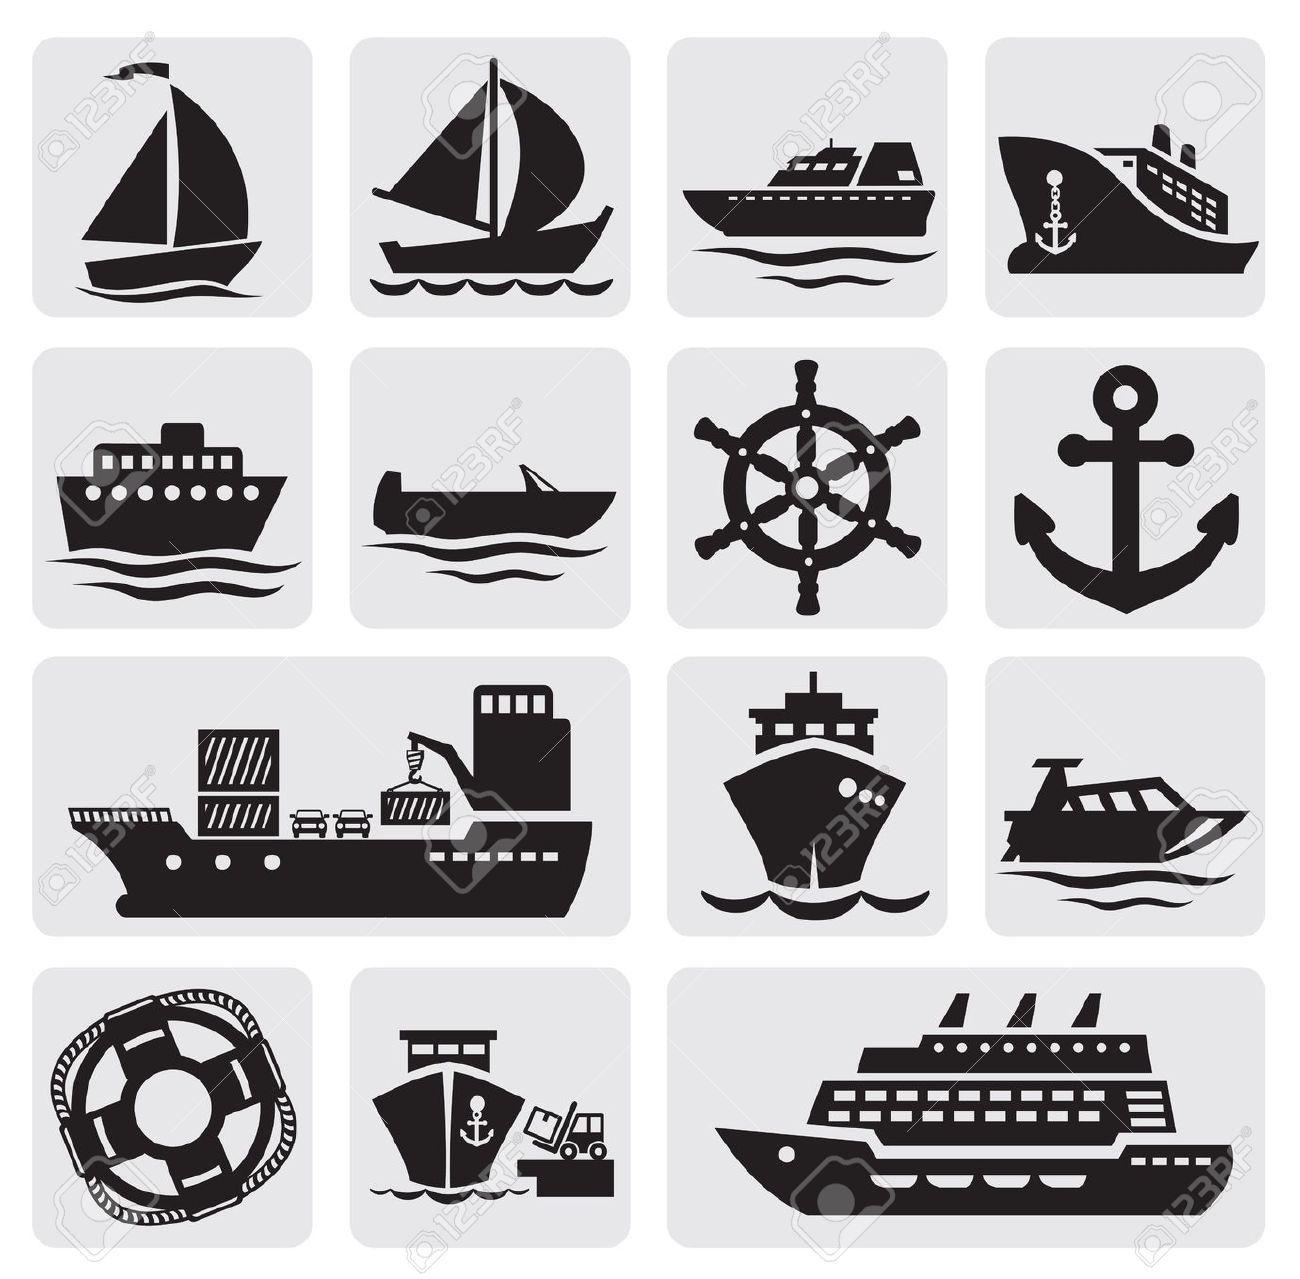 Stock Vector Boat icon, Ship logo, Boat illustration